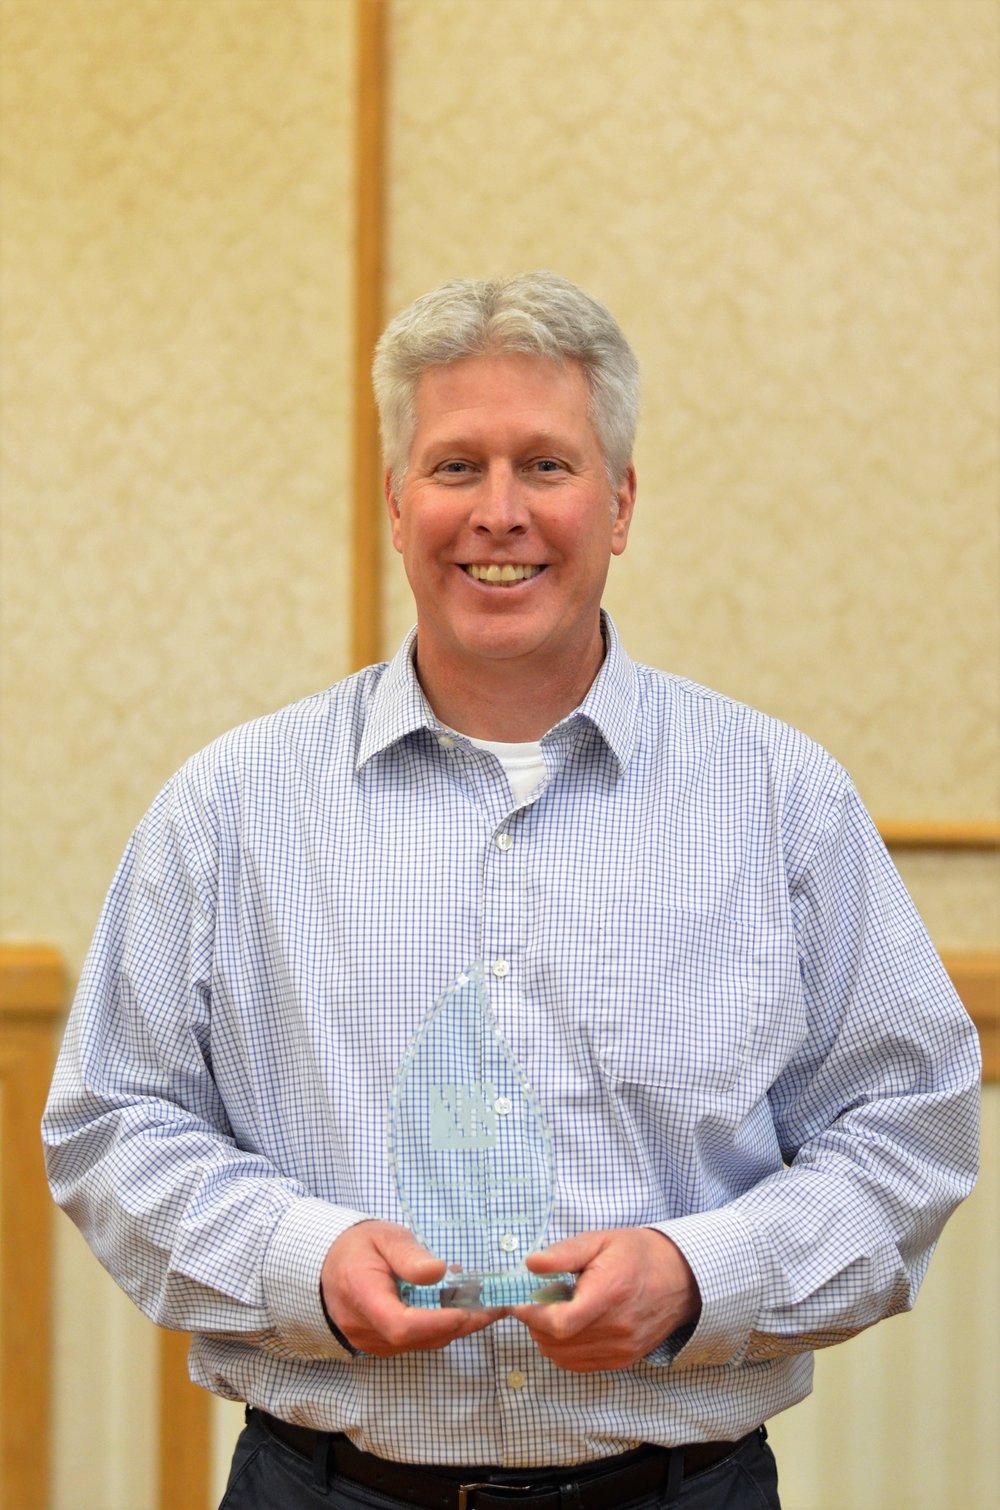 Award for a Leader - Planner of the Year - John Czarnezki